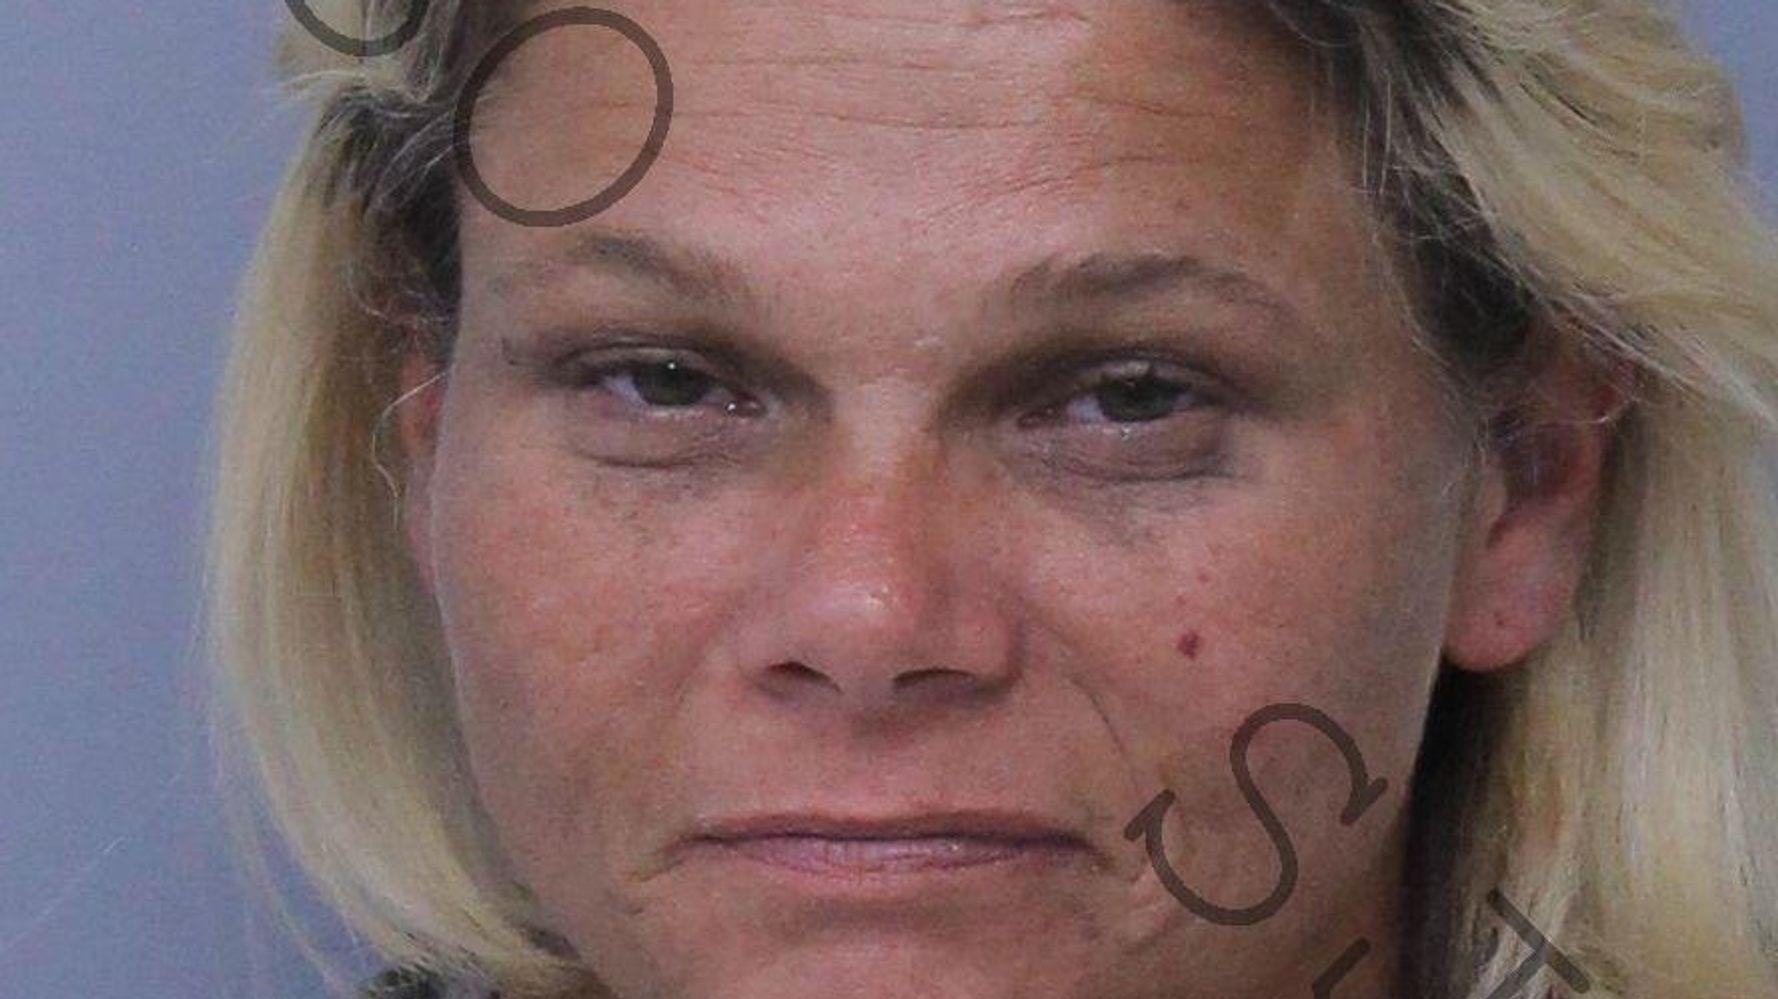 Florida Woman Named Crystal Methvin Arrested For